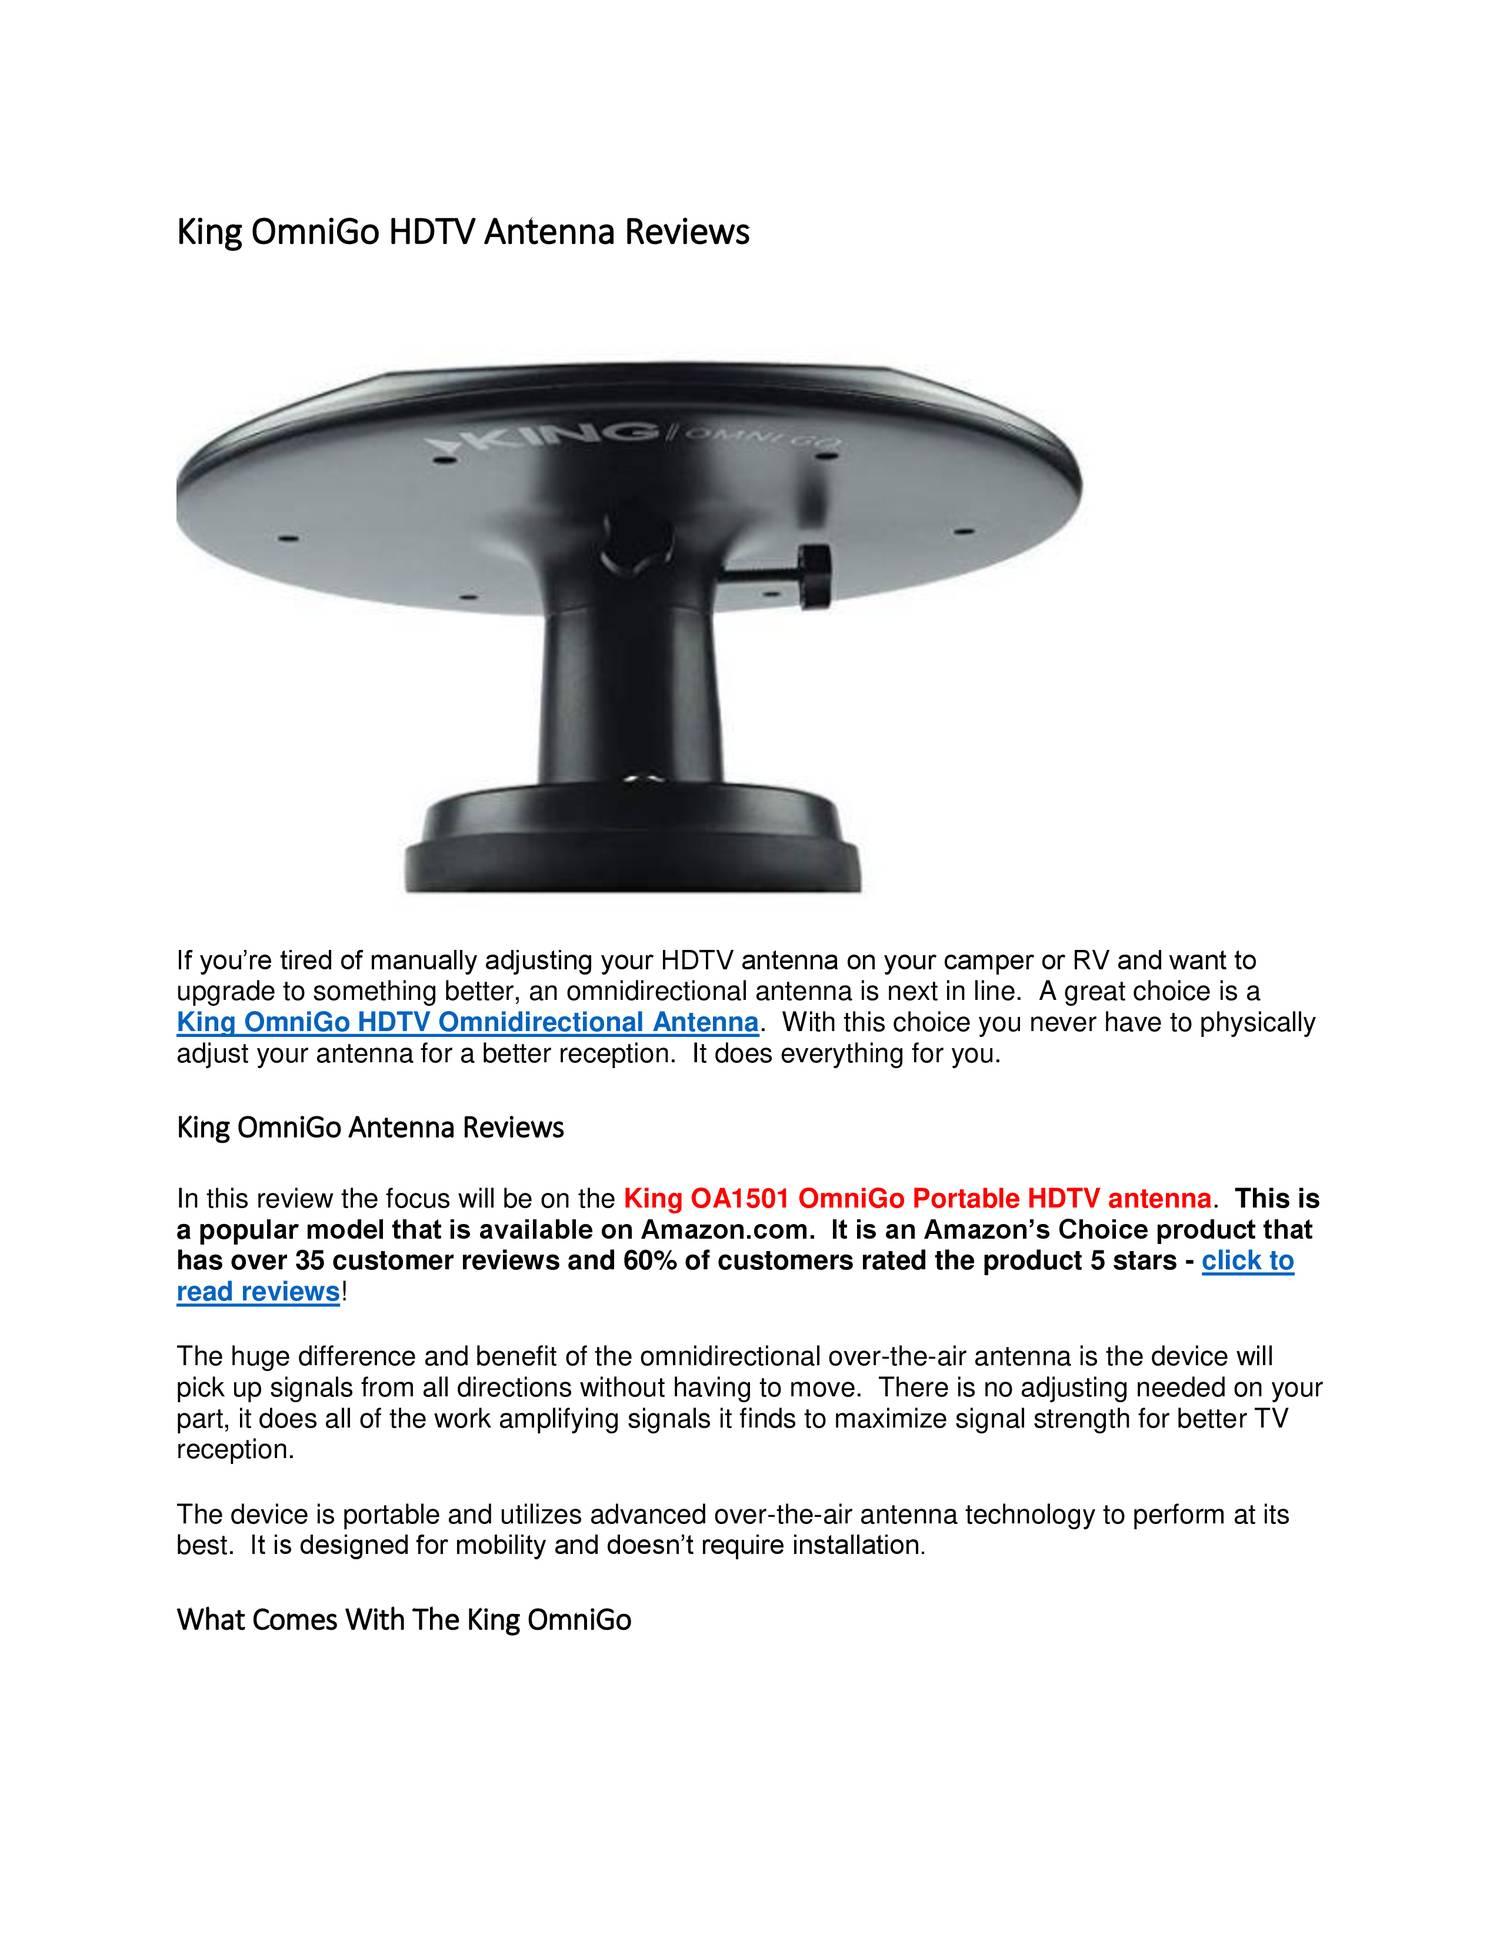 King OmniGo HDTV Antenna Reviews docx   DocDroid